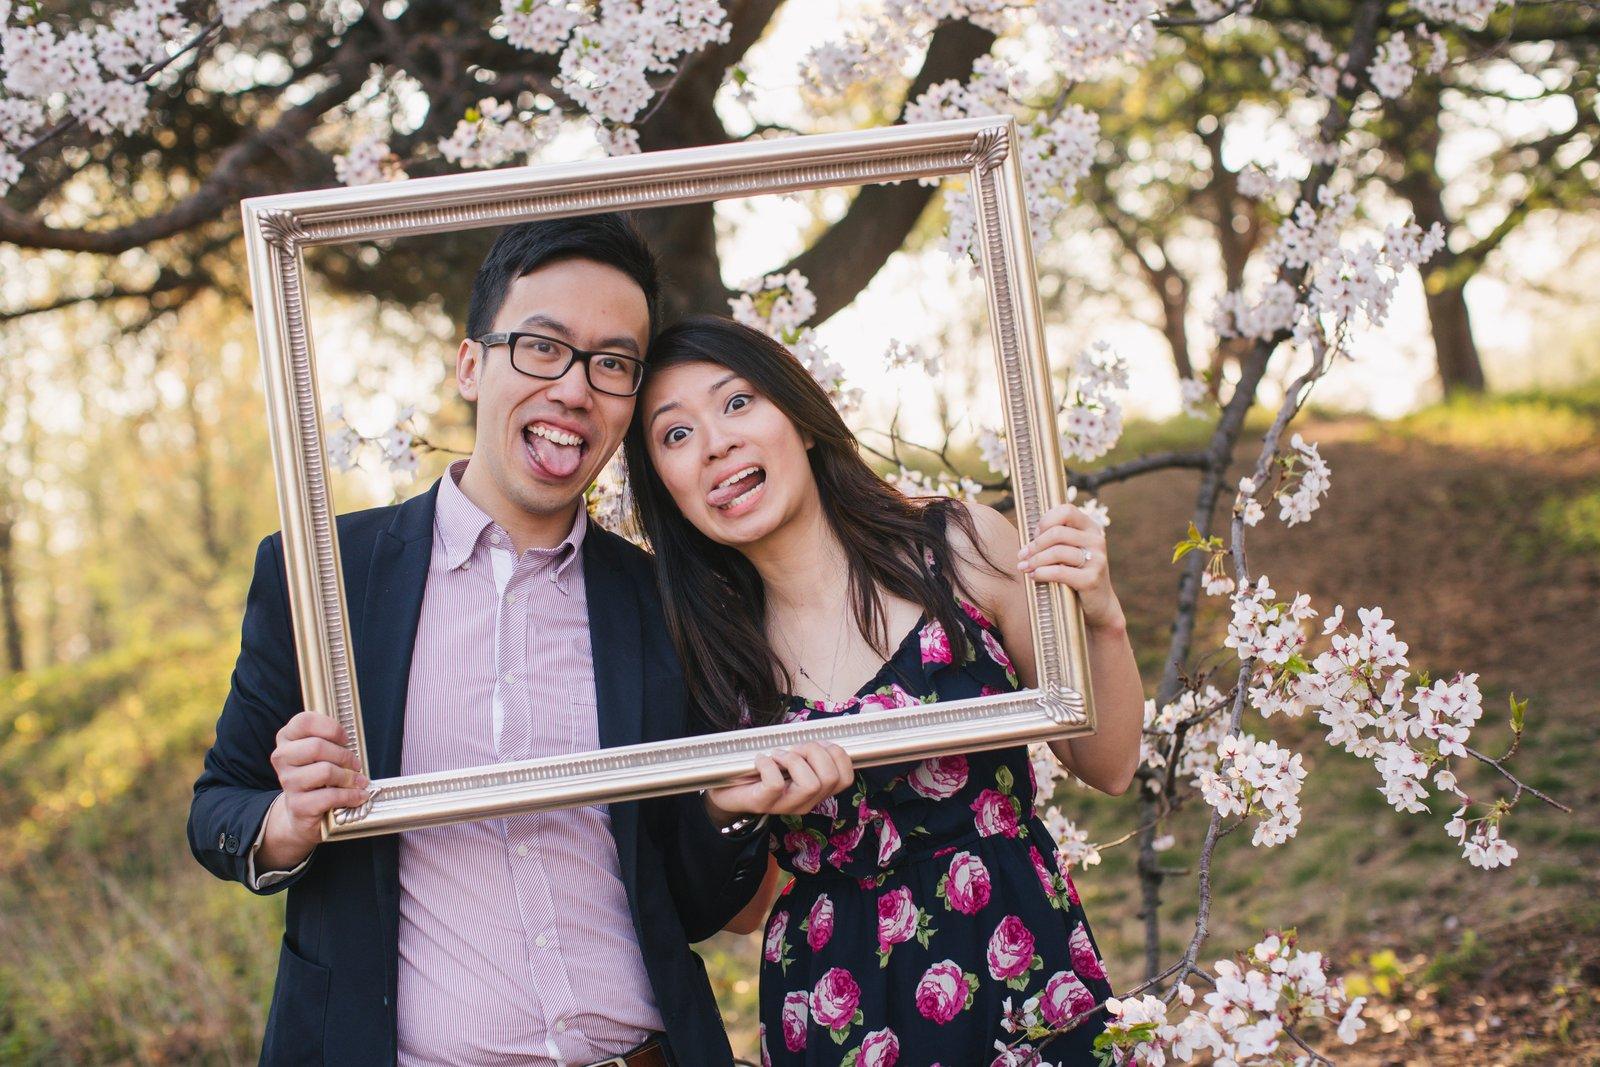 Jessica-Charles-Engagement-High-Park-Cherry-Blossom-017